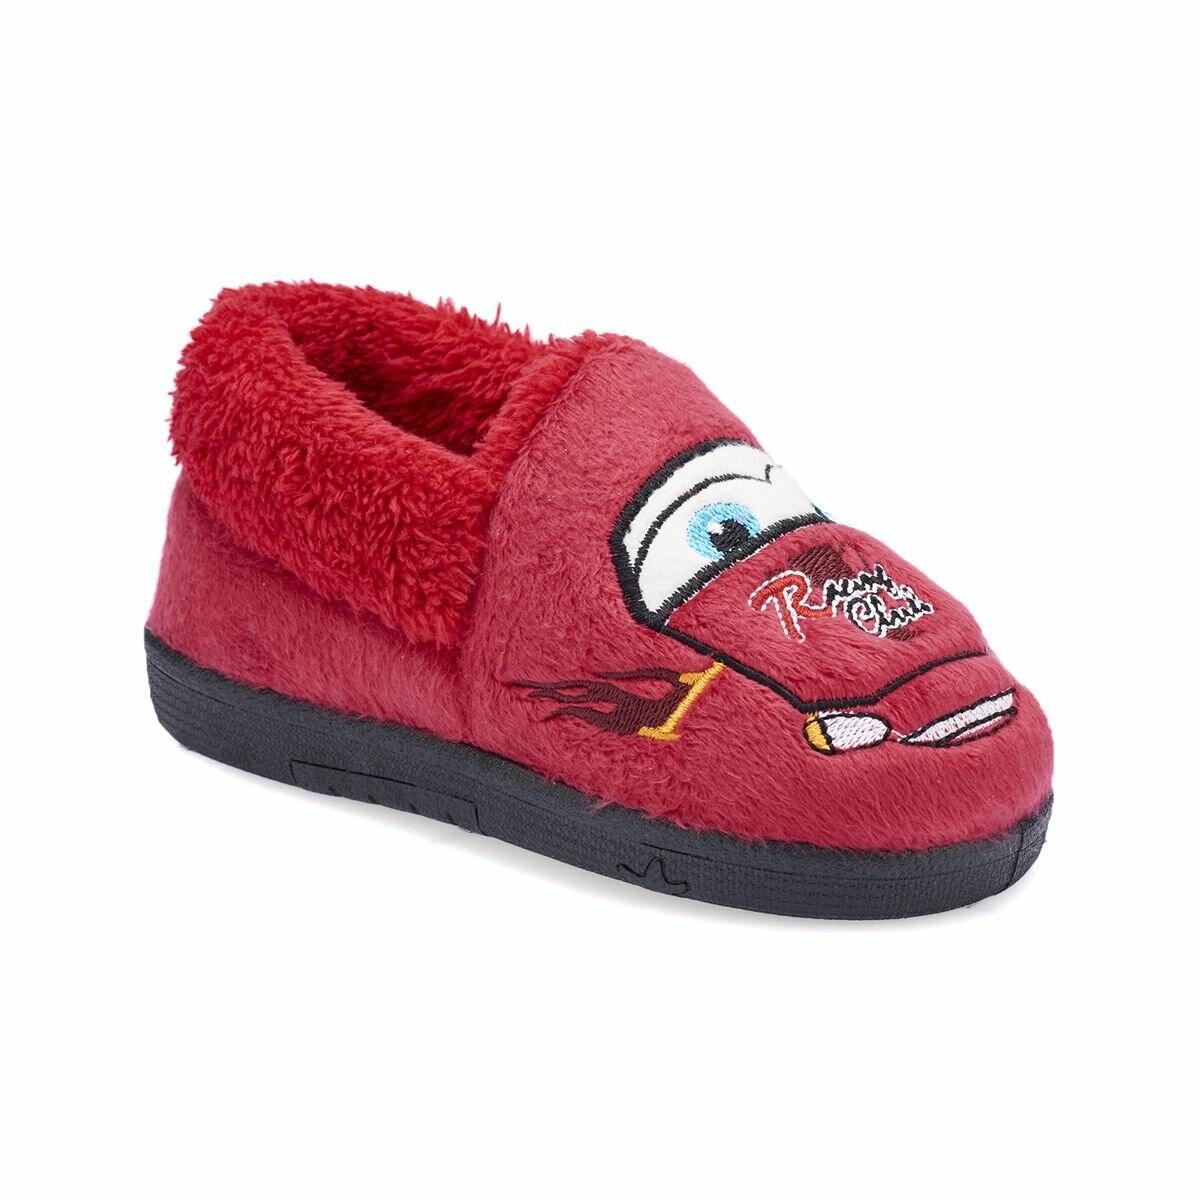 FLO 82.510924.P Red Male Child Panduf Polaris